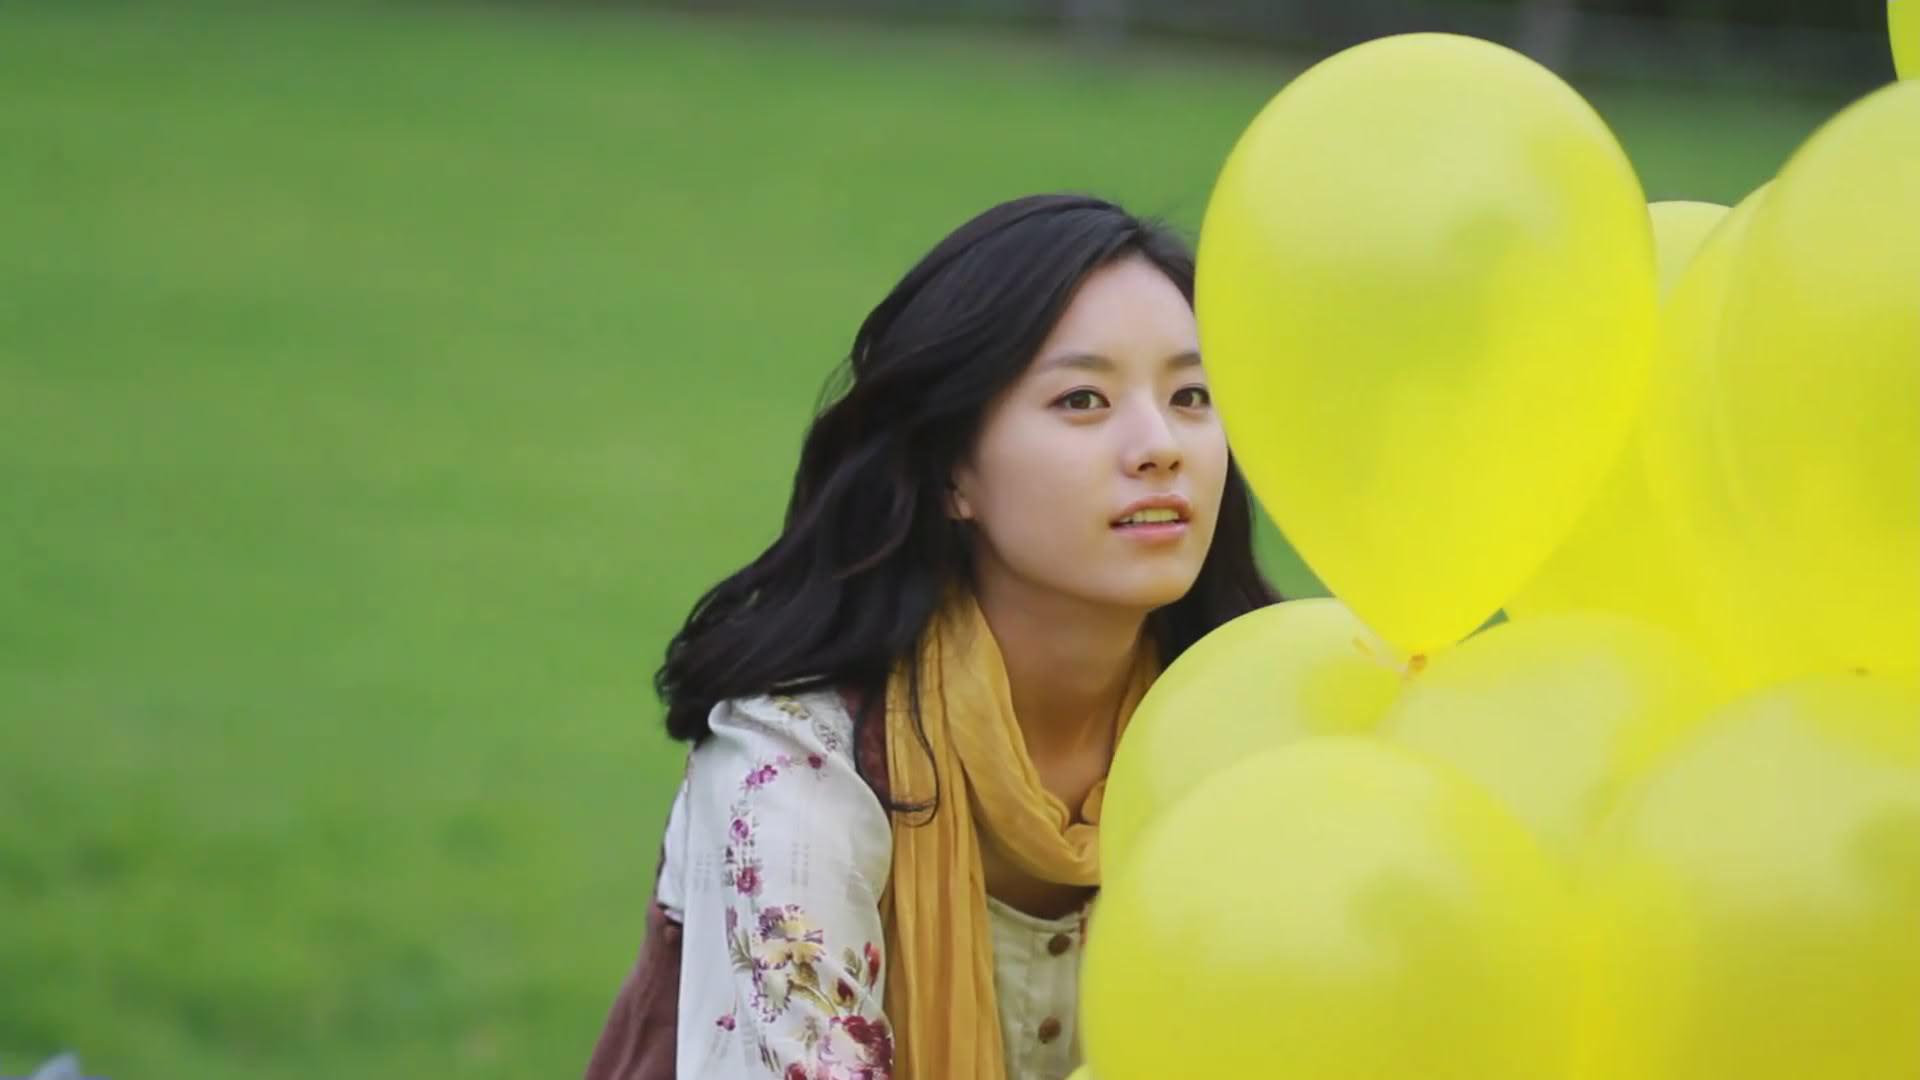 Han Hyo Joo High Definition Wallpapers